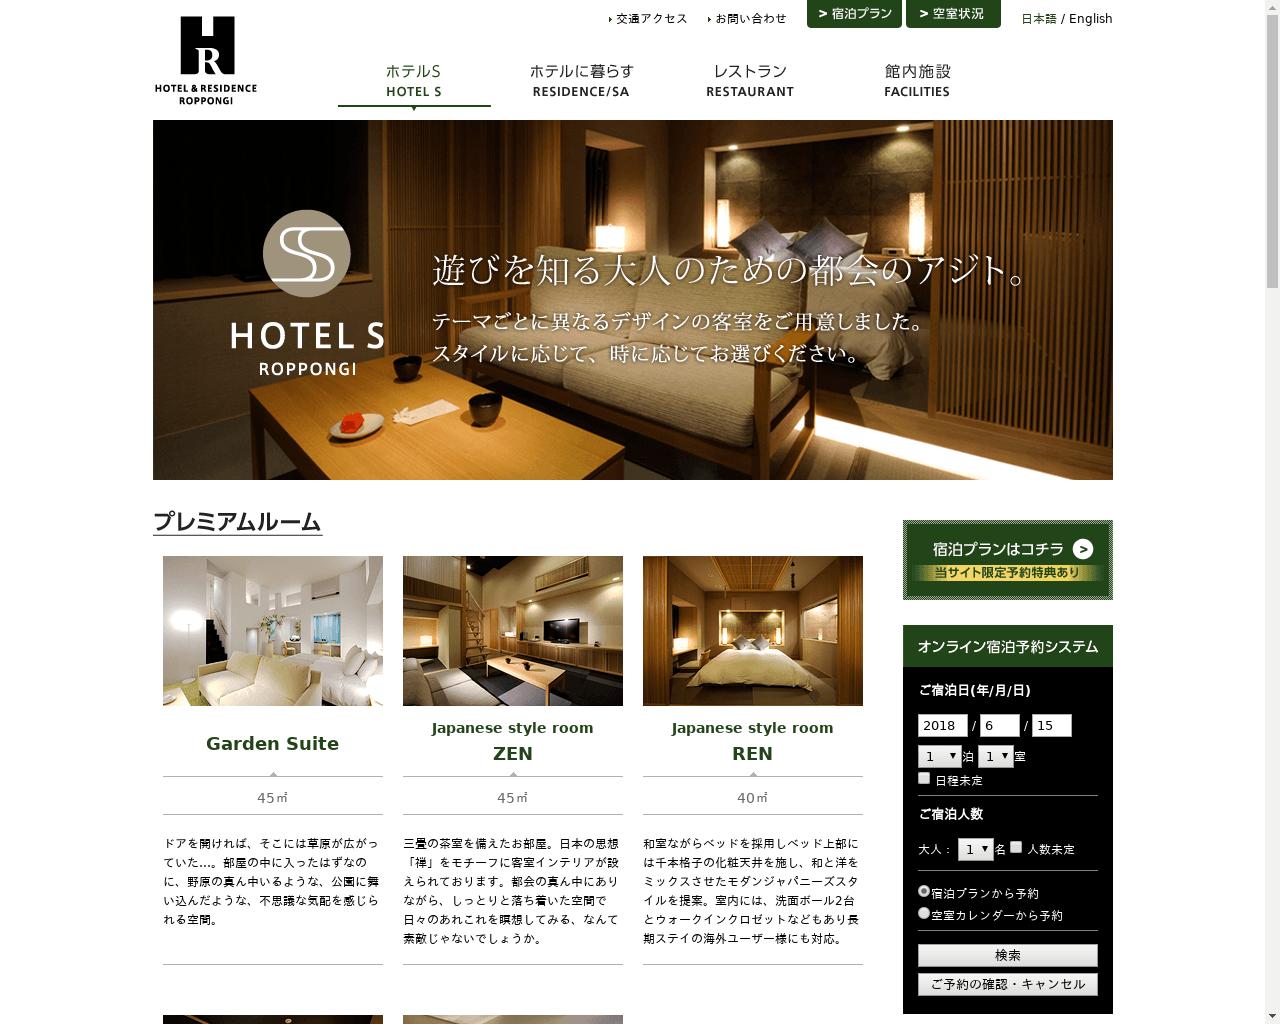 ROPPONGI HOTEL S(六本木ホテルS)